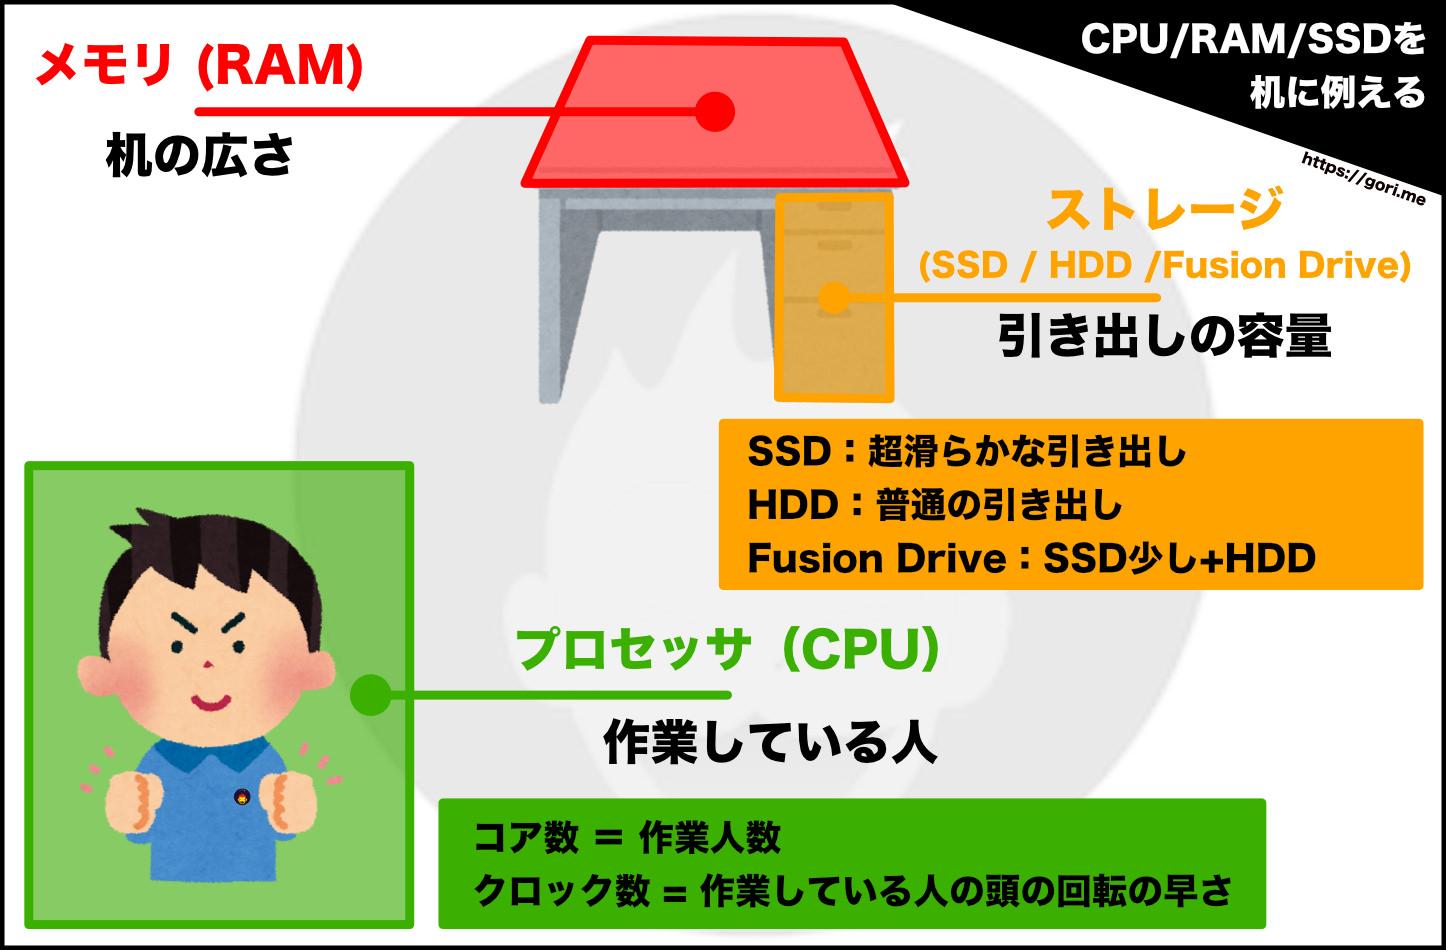 CPU RAM SSD Image